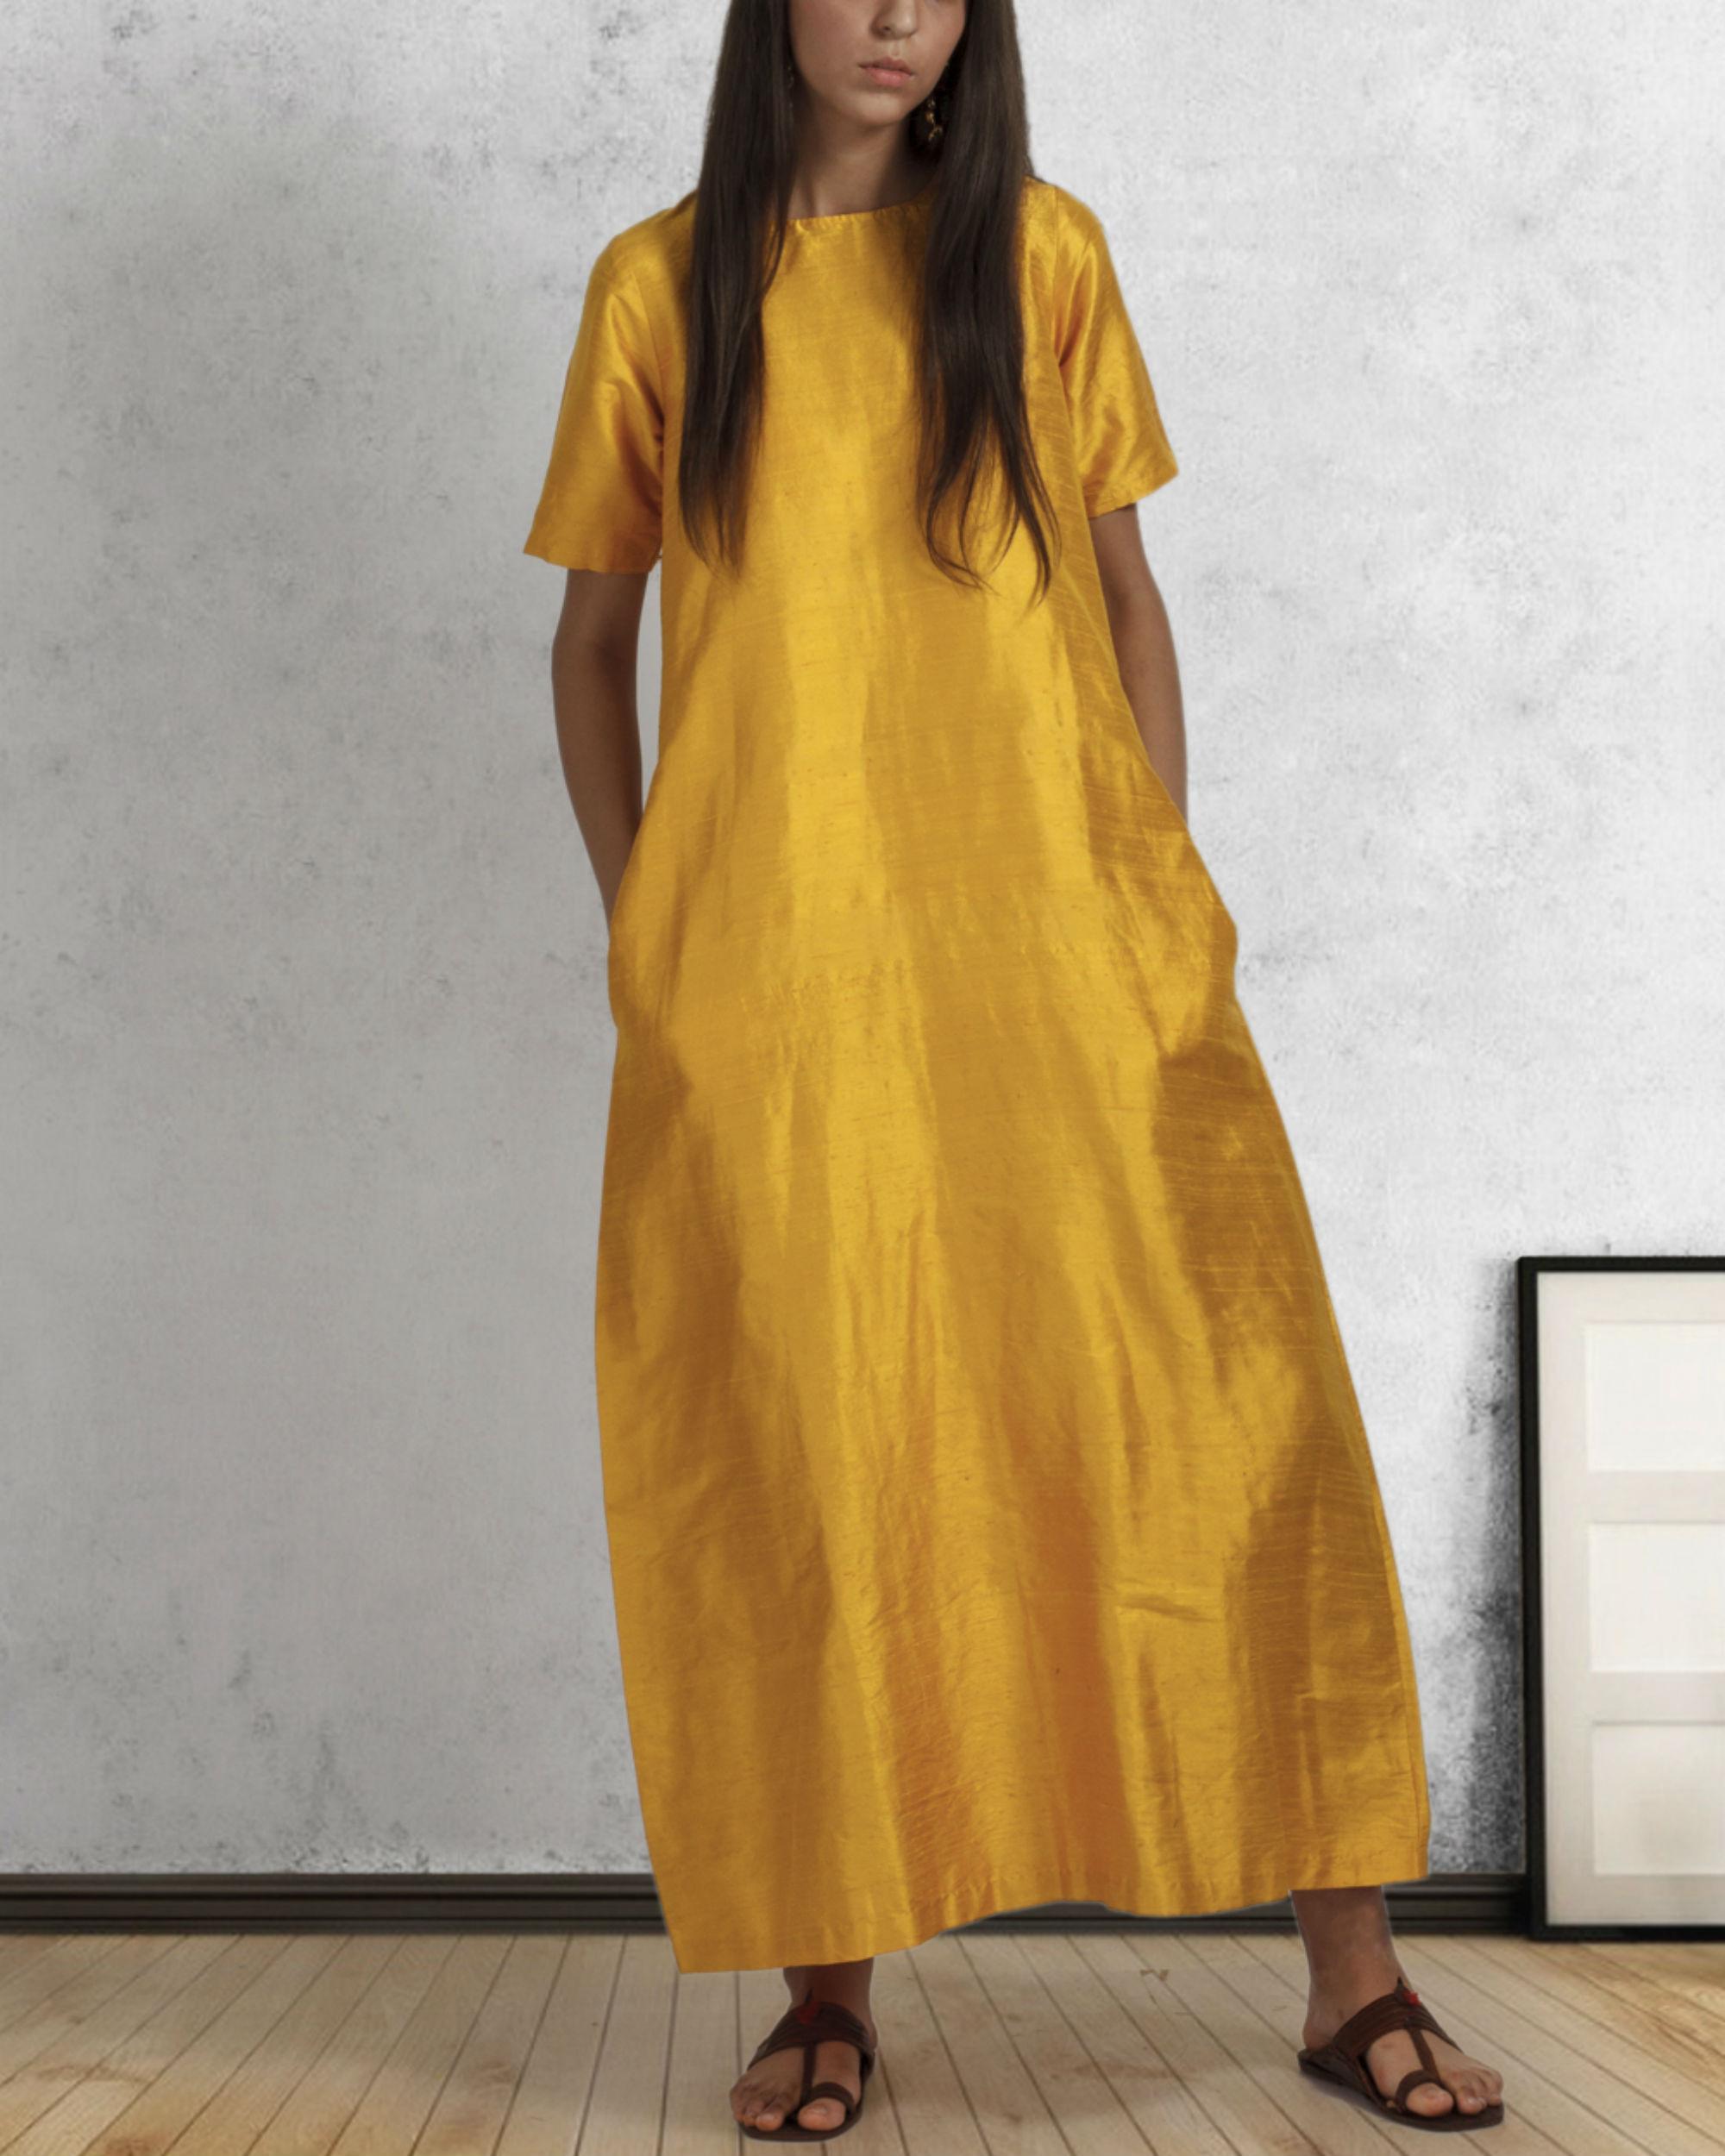 Yellow silk box dress